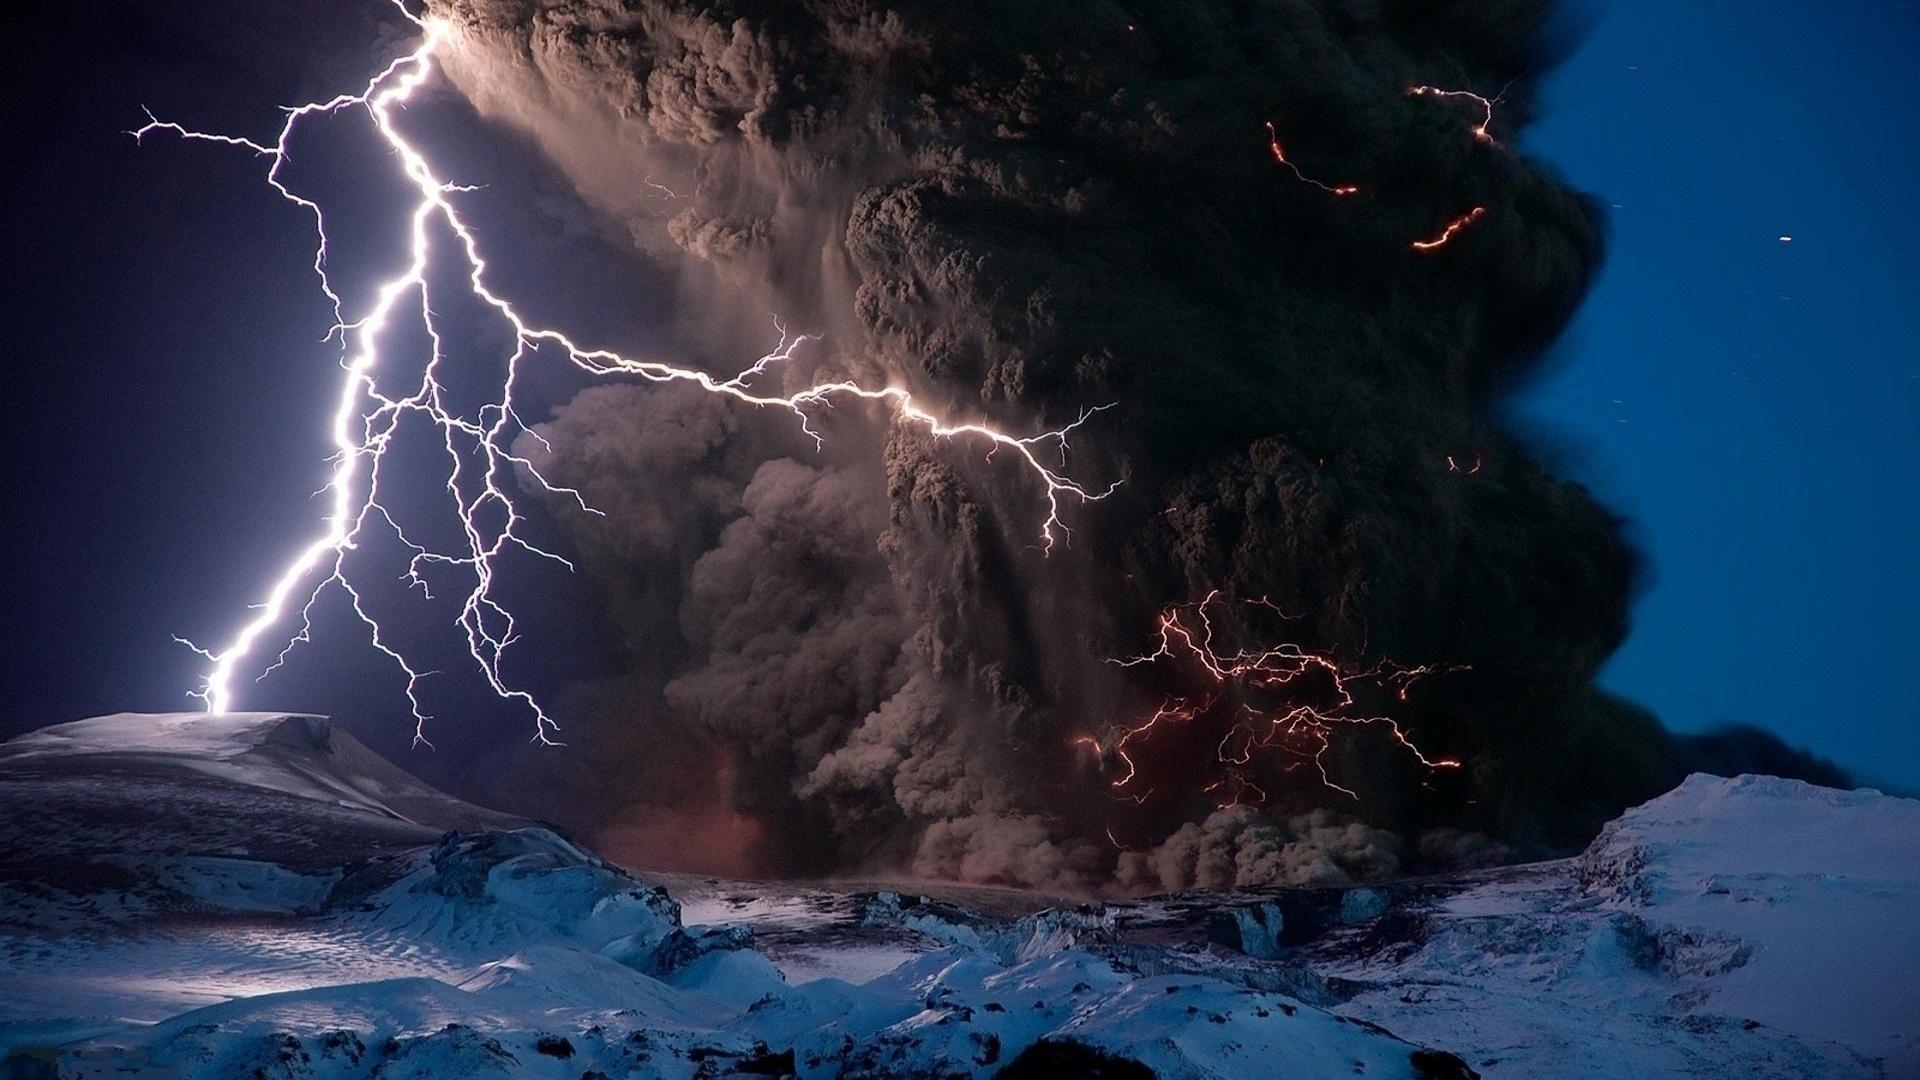 Volcano In Iceland 2011